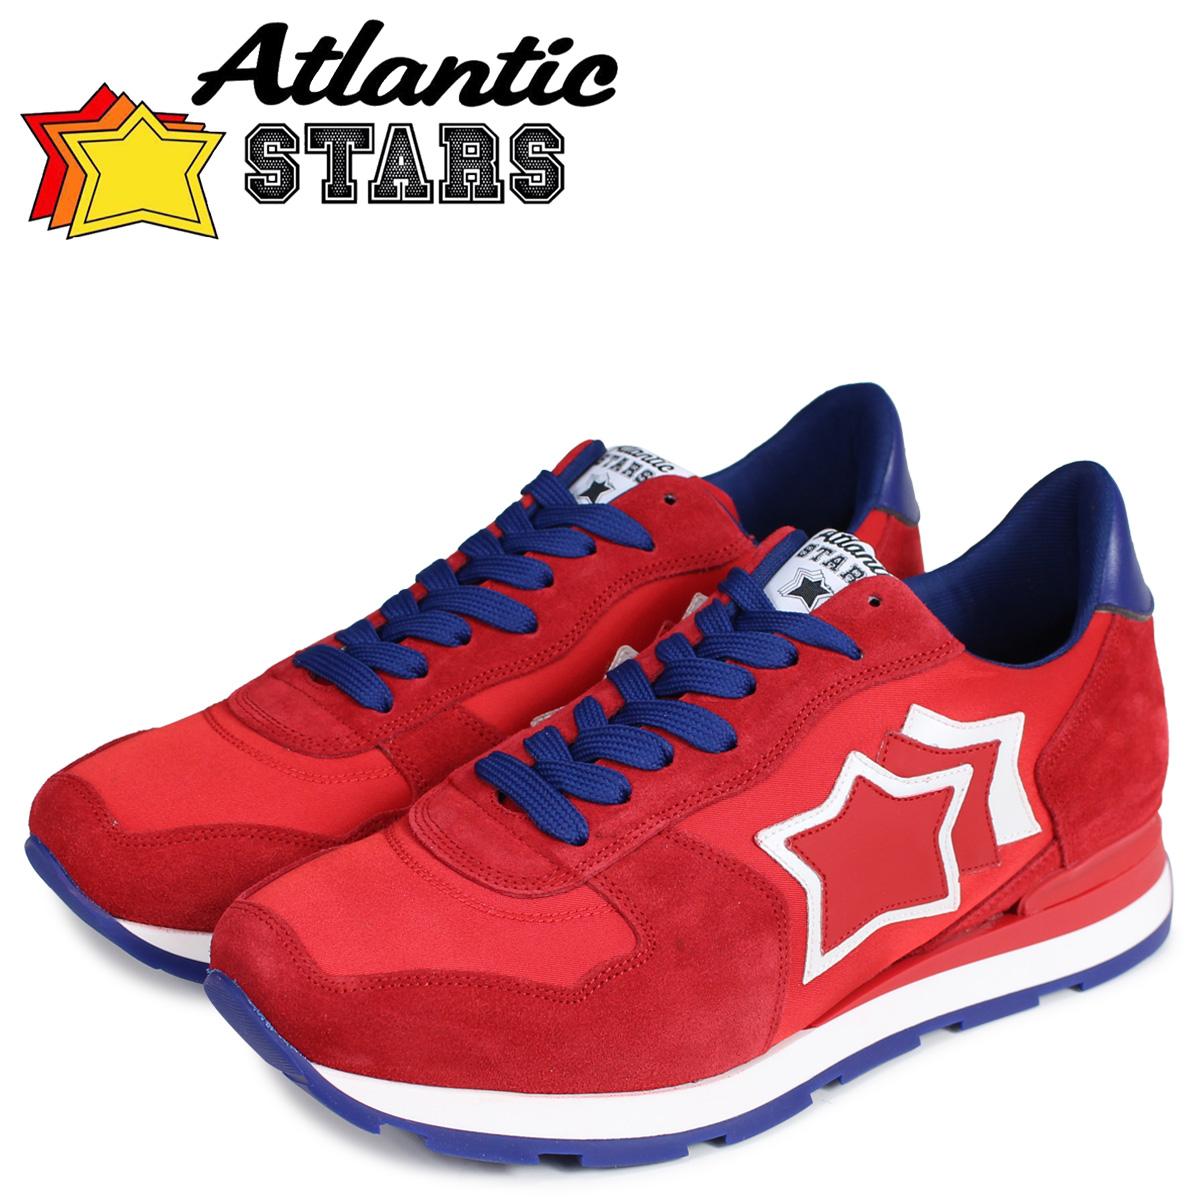 Atlantic STARS アトランティックスターズ アンタレス スニーカー メンズ ANTARES レッド 赤 RBR-14R [4/13 追加入荷]